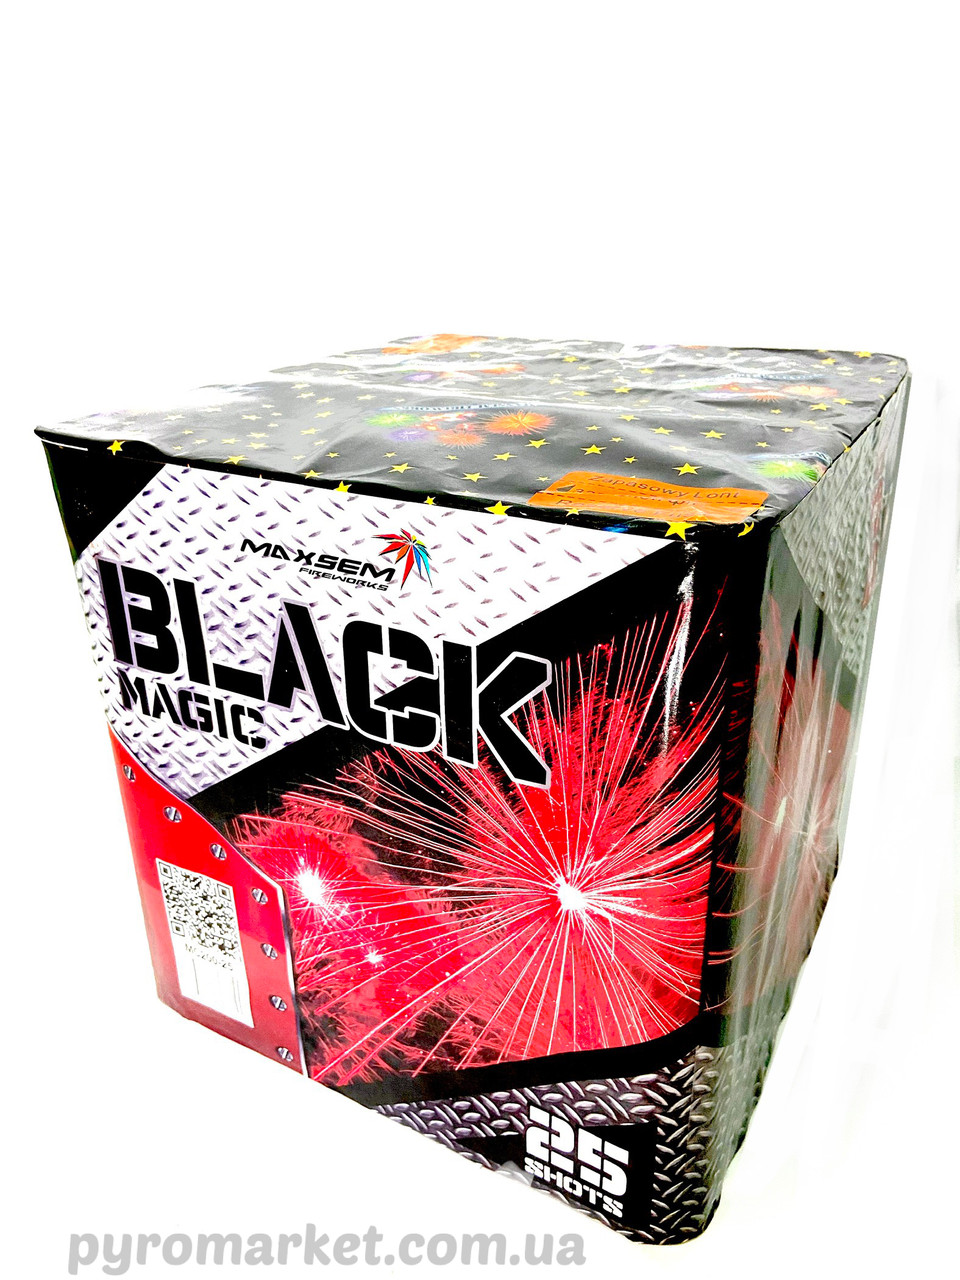 Салют Black magic Maxsem Mc200-25, 25 выстрелов 50мм